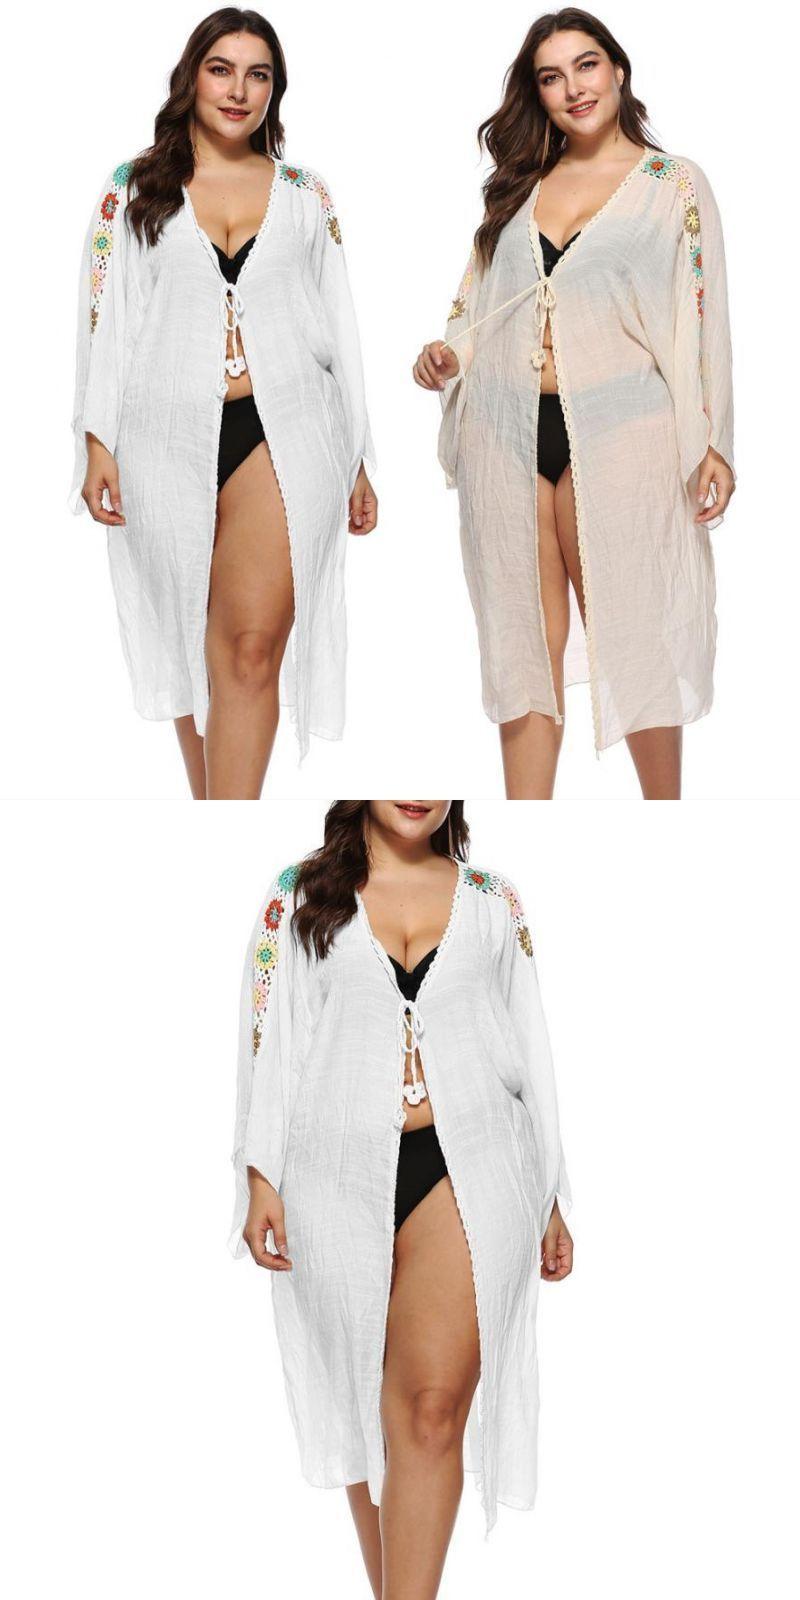 a2b034e42e 2018 new beach cover up bikini crochet knitted tassel tie beachwear summer swimsuit  cover up sexy